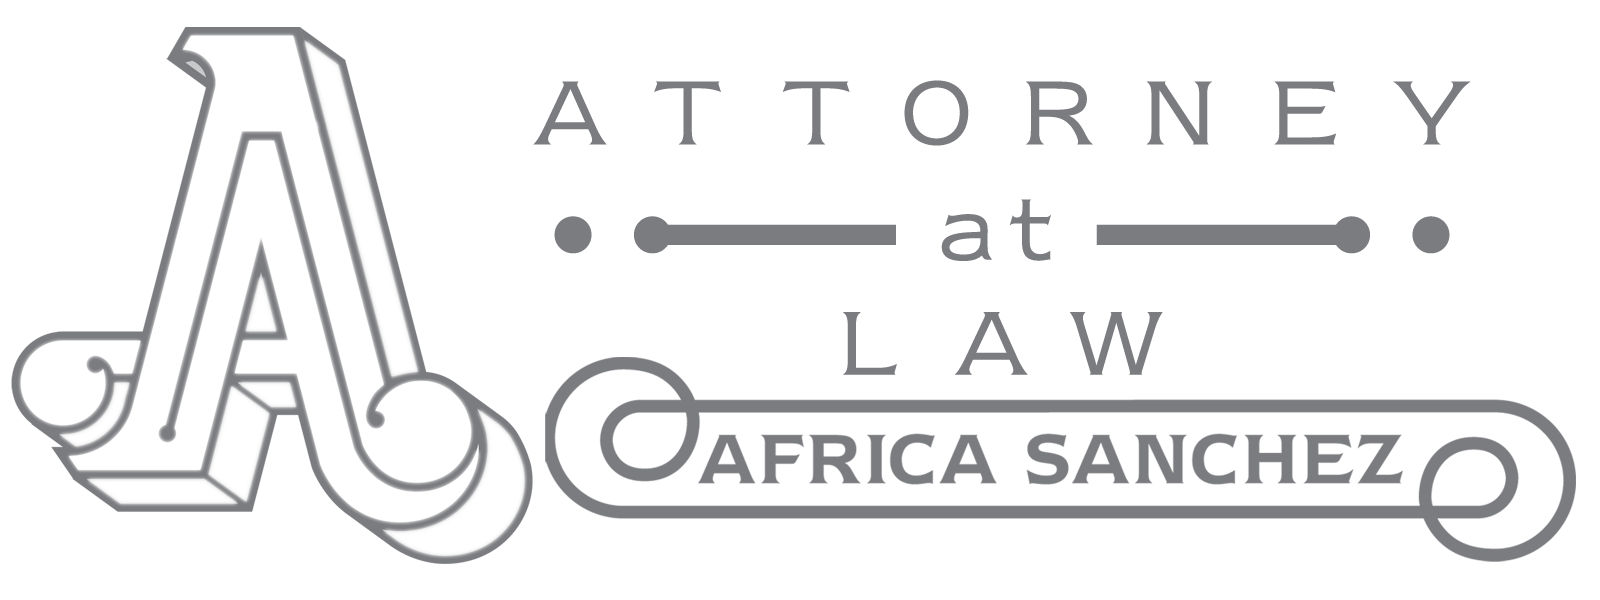 Law Office of Africa A. Sanchez, Esq